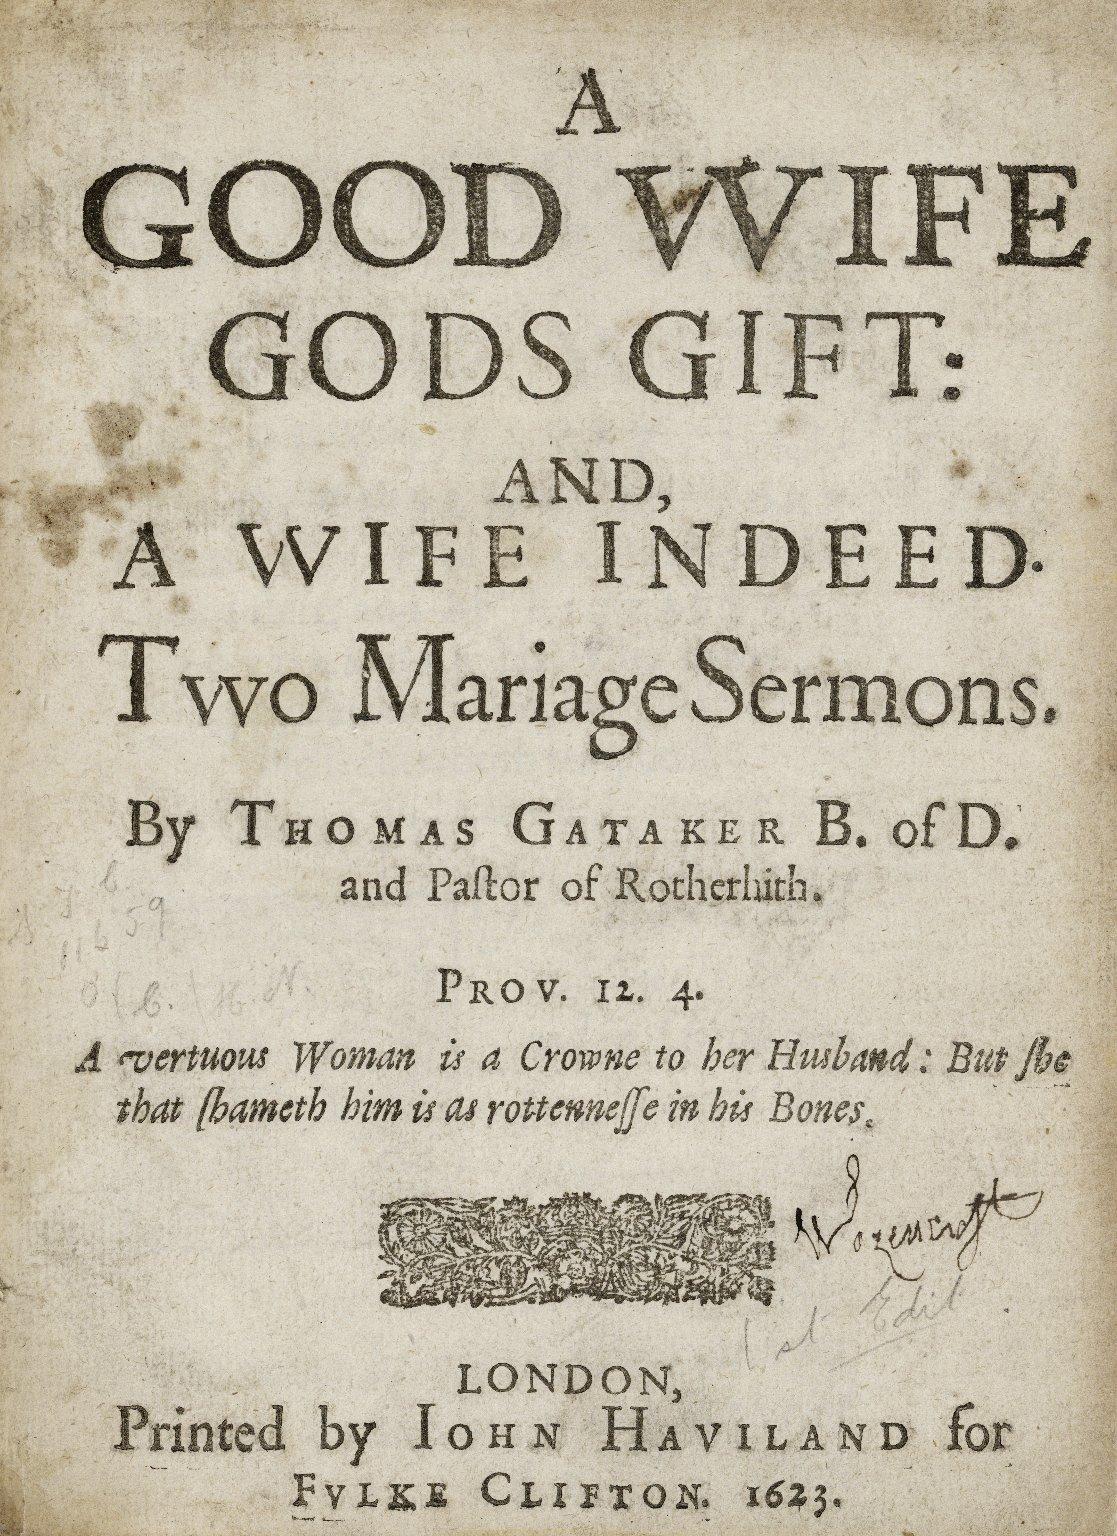 A good vvife Gods gift: and, a vvife indeed…